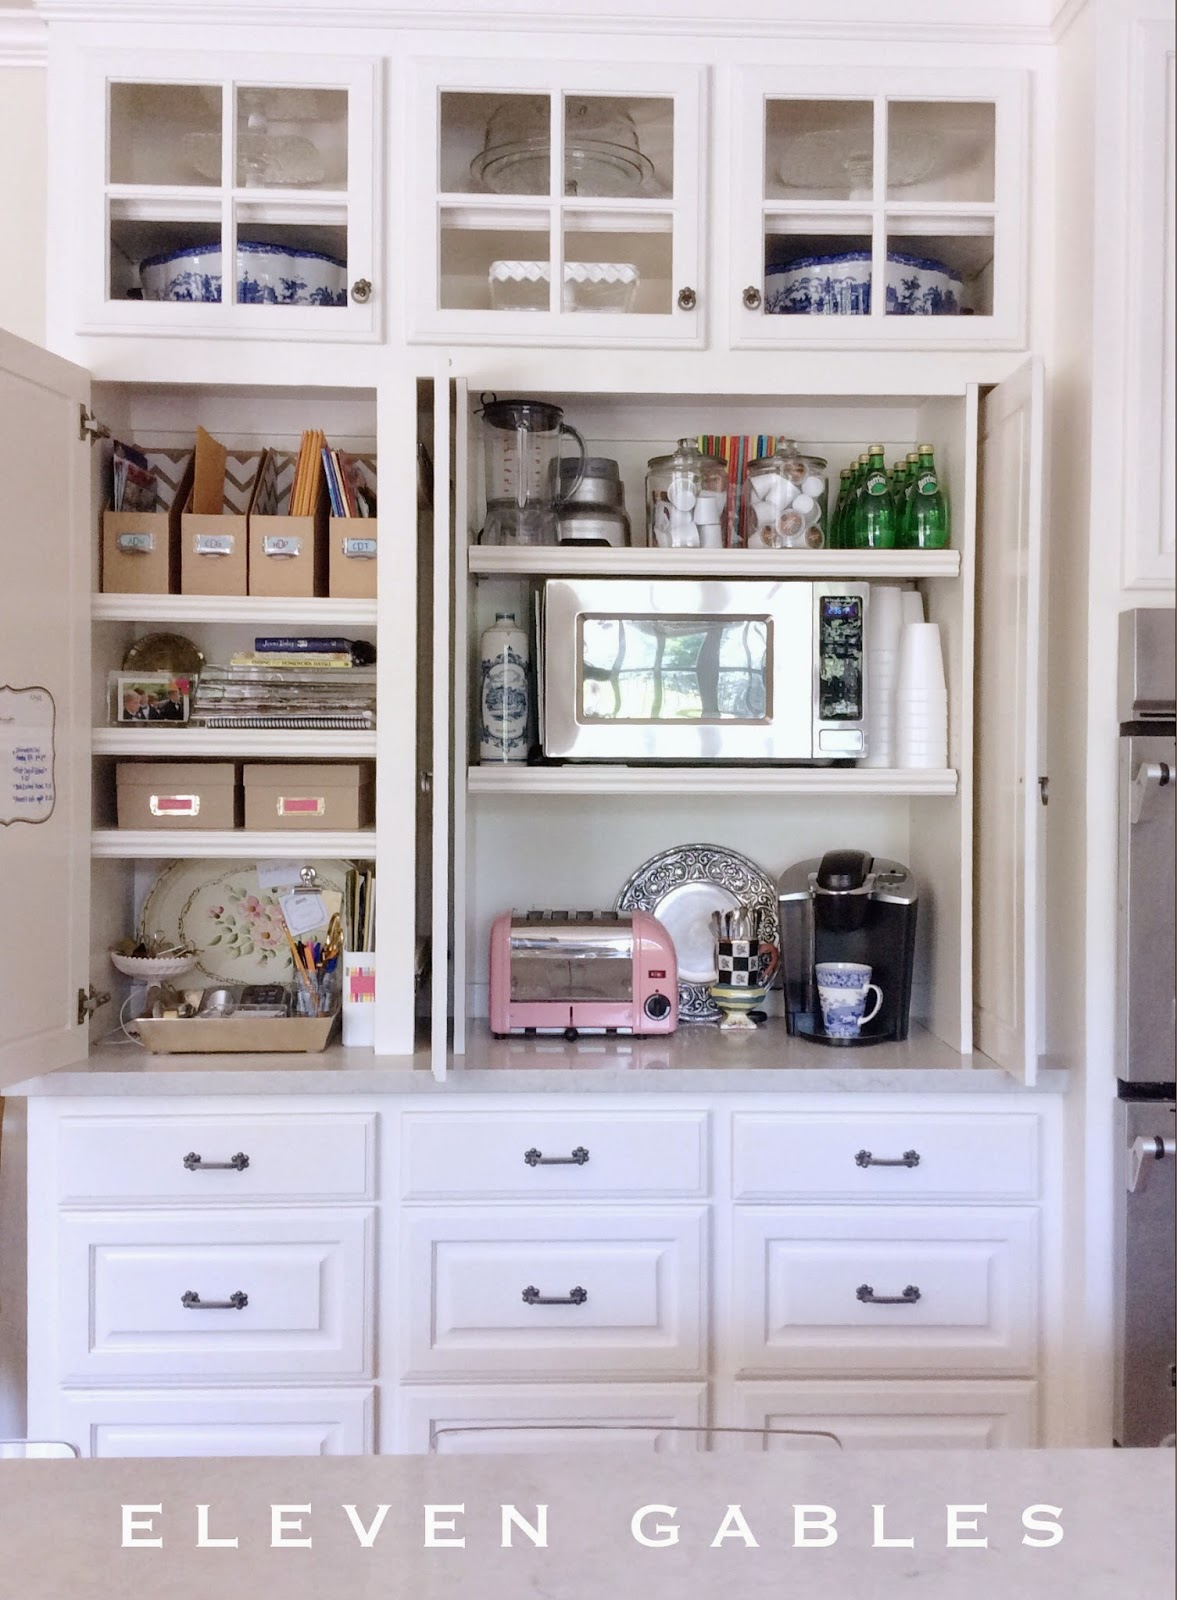 Eleven Gables Hidden Appliance Cabinet And Desk Command